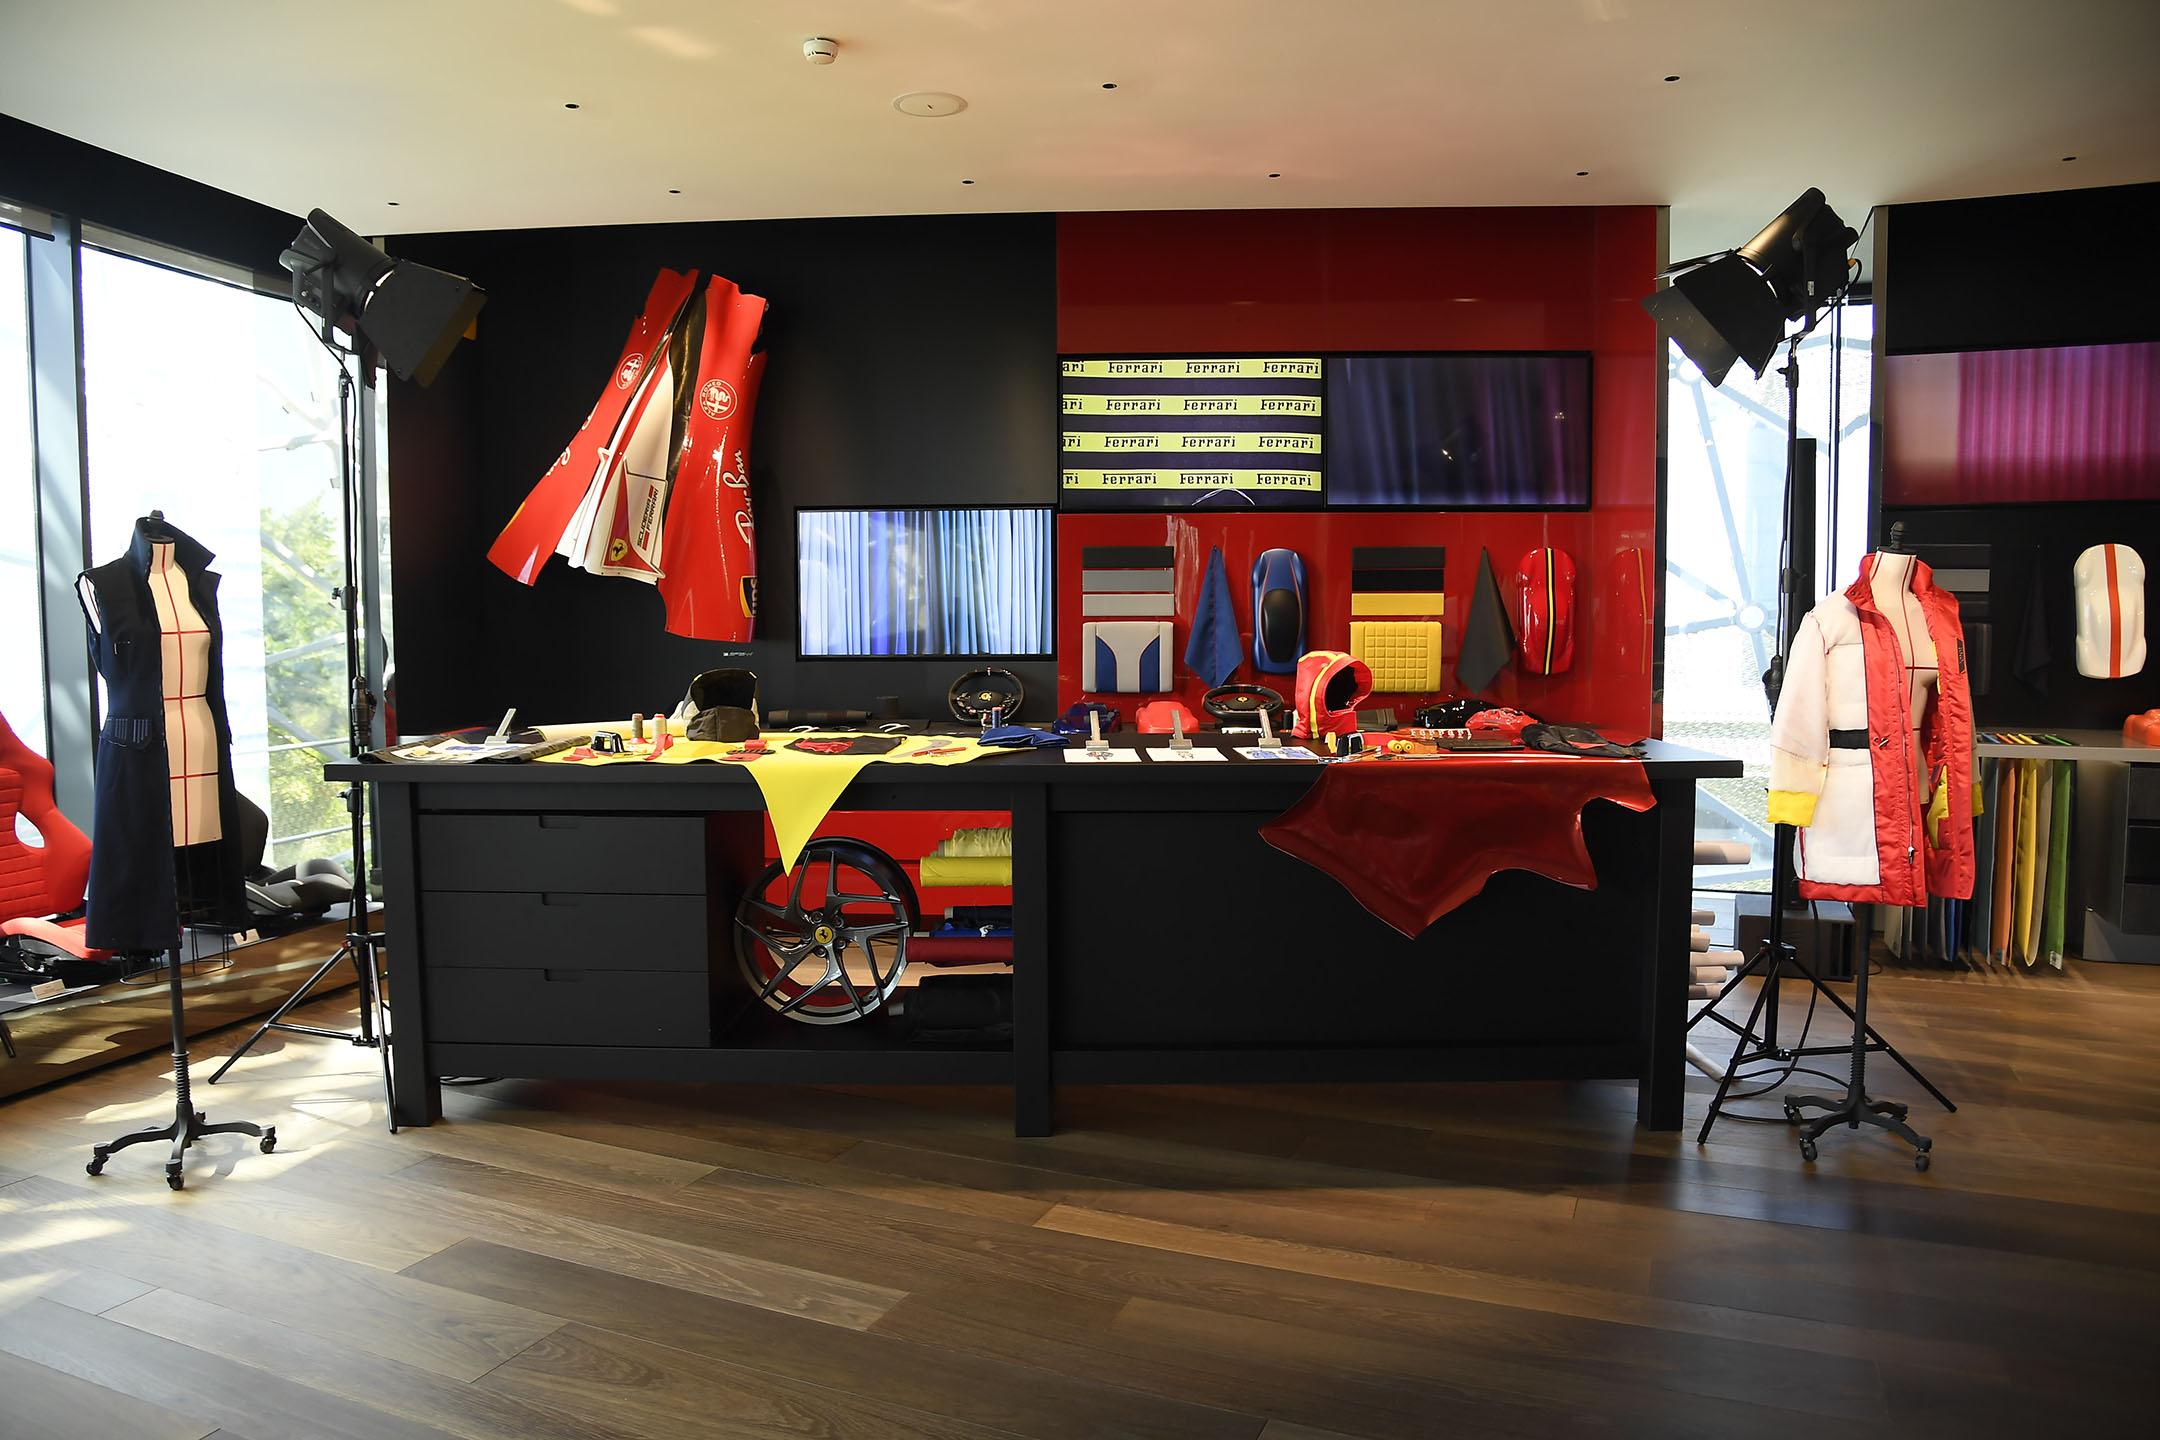 Ferrari fashion show - behind the scenes - office - 2021 - photo by Giovanni Giannoni via WWD